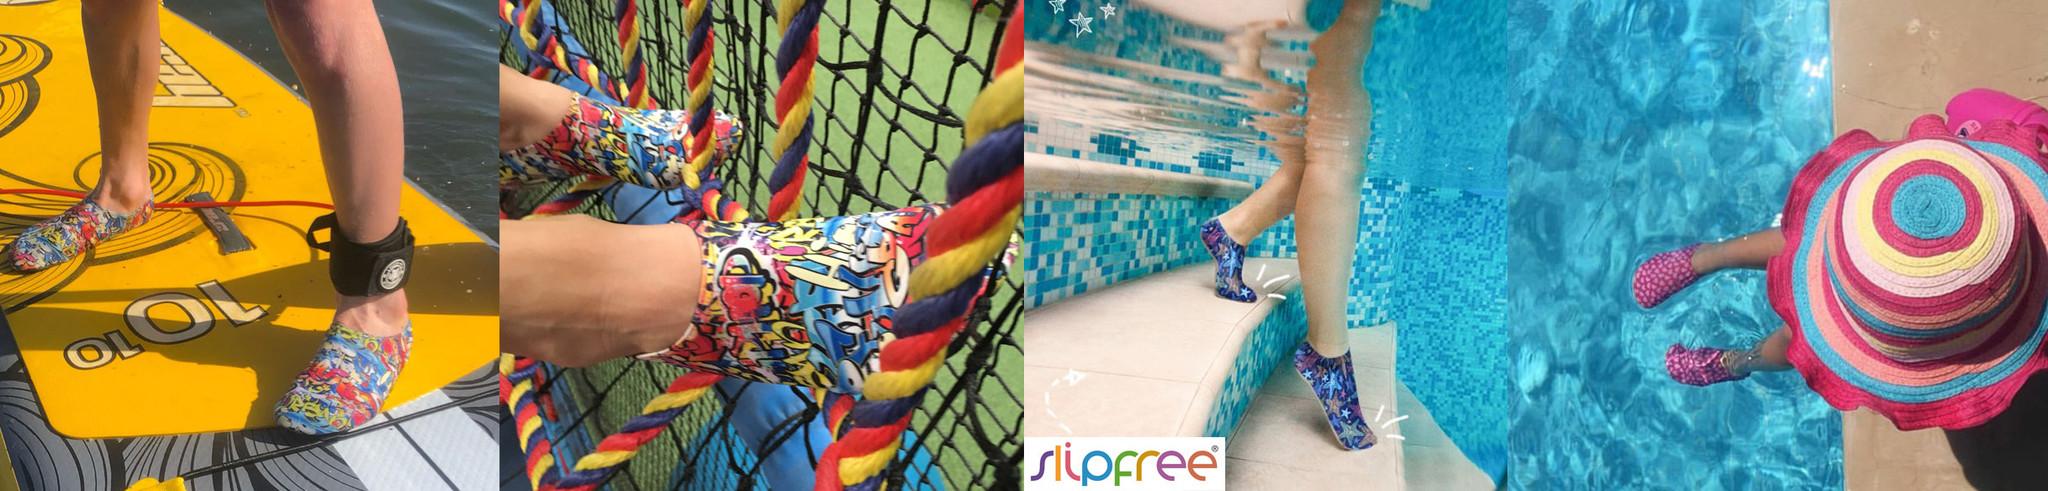 Slip free